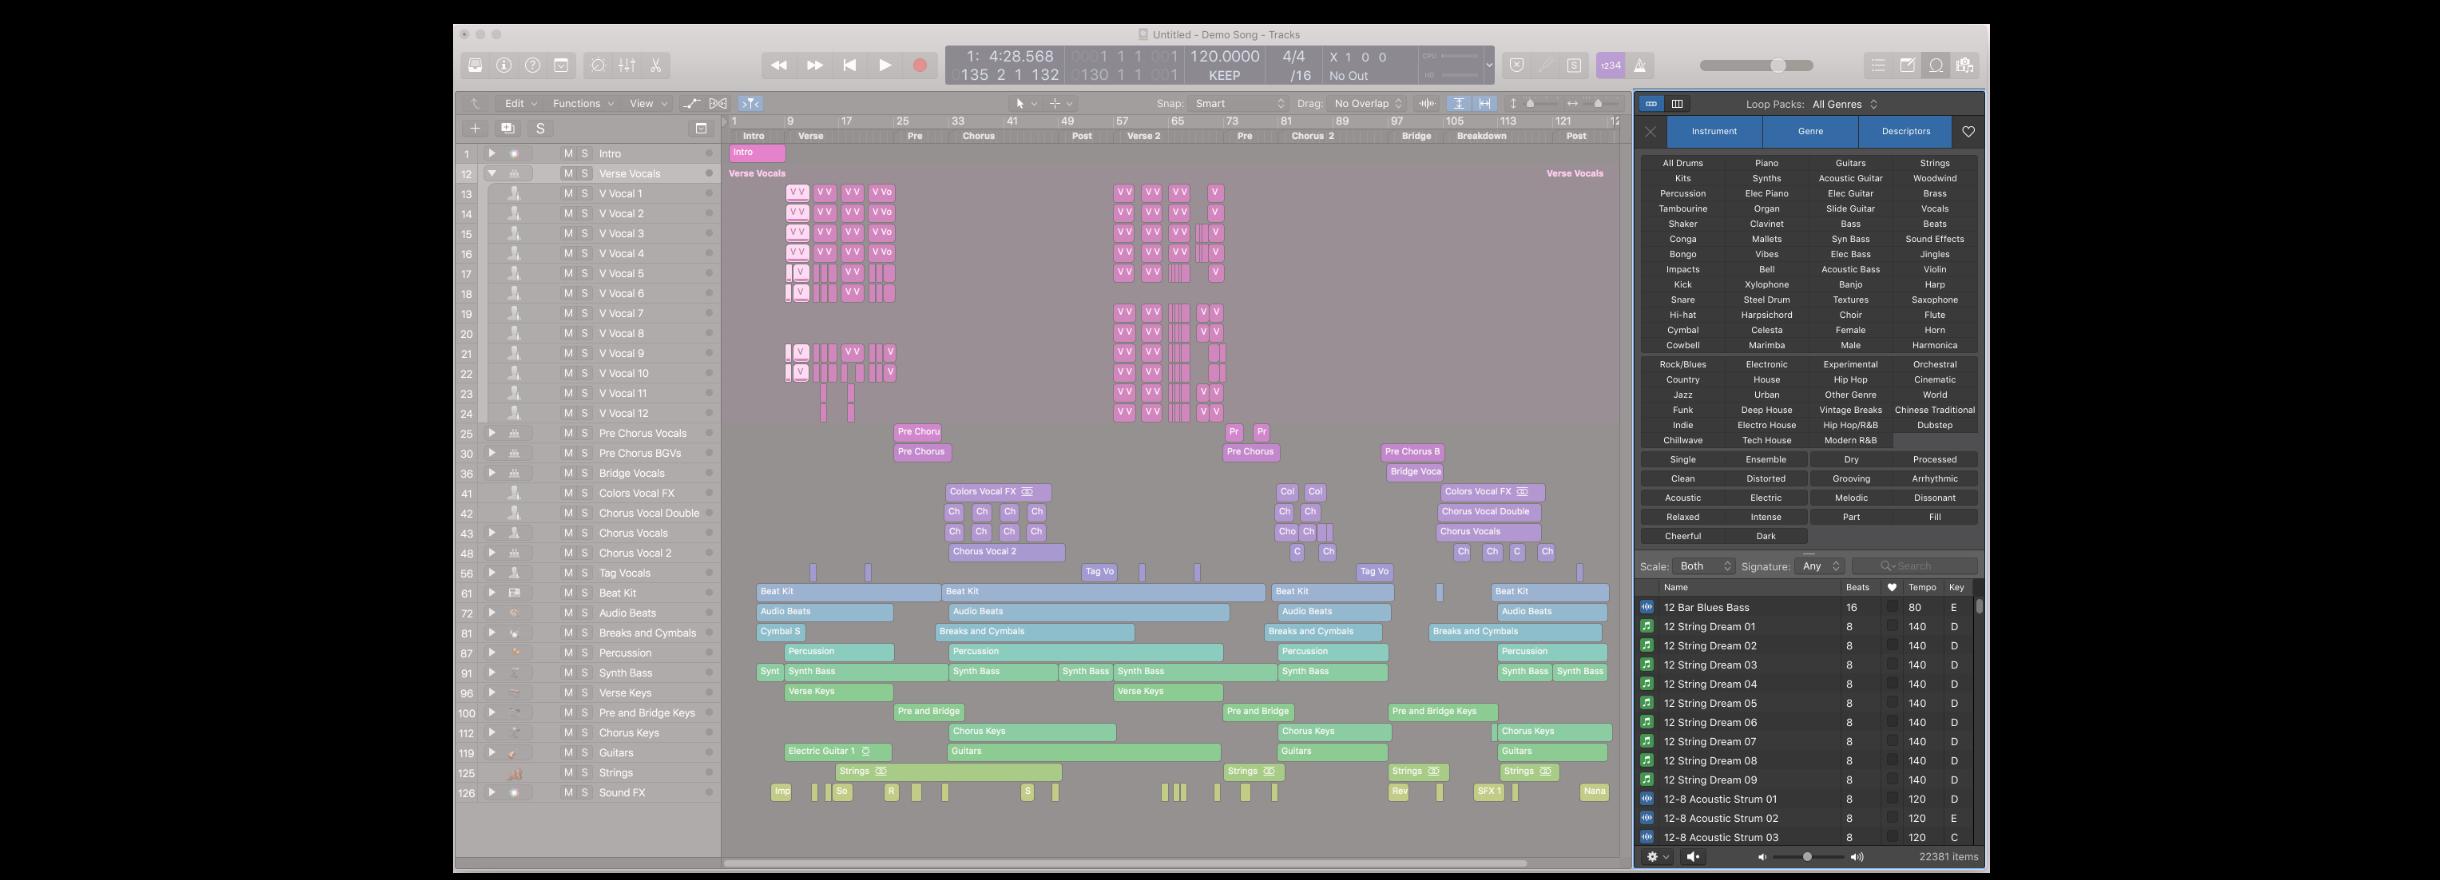 Loop 視窗是一個很好用的視窗,使用得當的話,在創作音樂時可以獲得許多靈感。開啟 Loop 視窗的快捷鍵是英文字母的 o